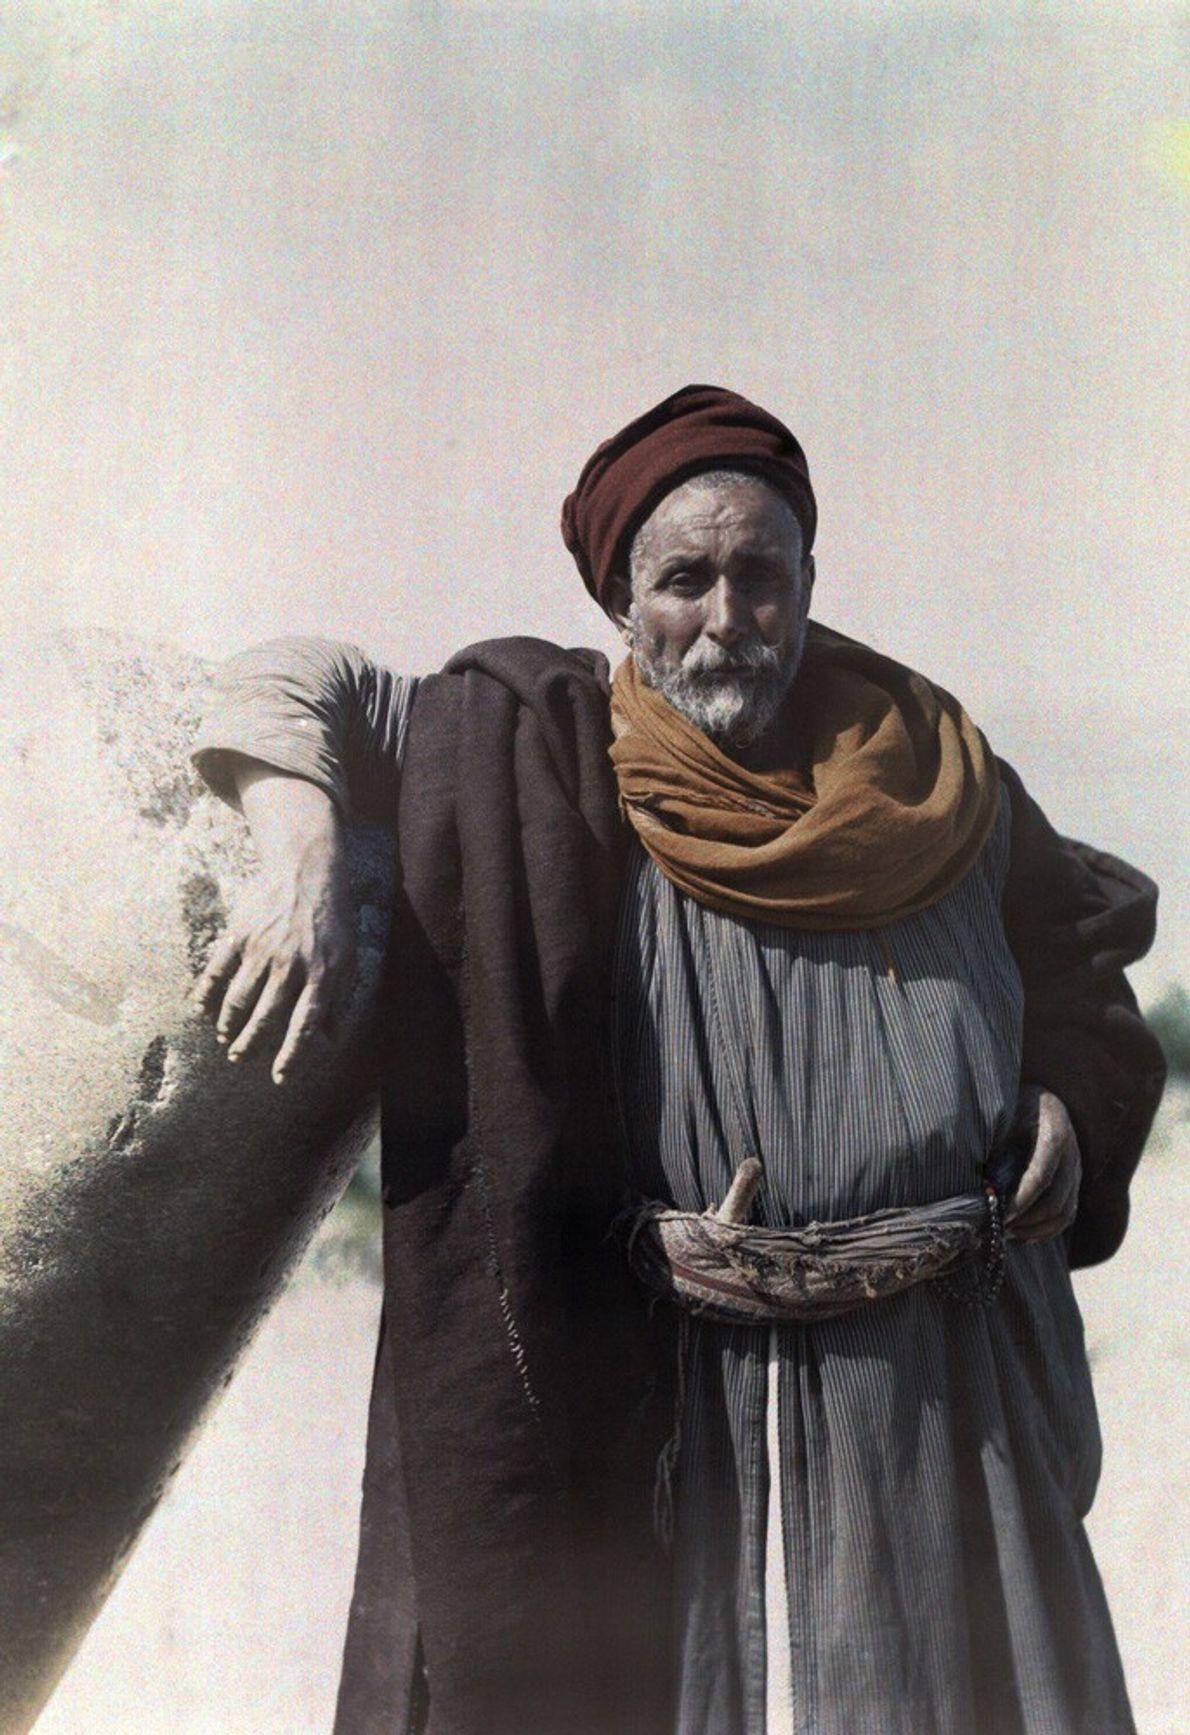 Jefe de una tribu nómada beduina